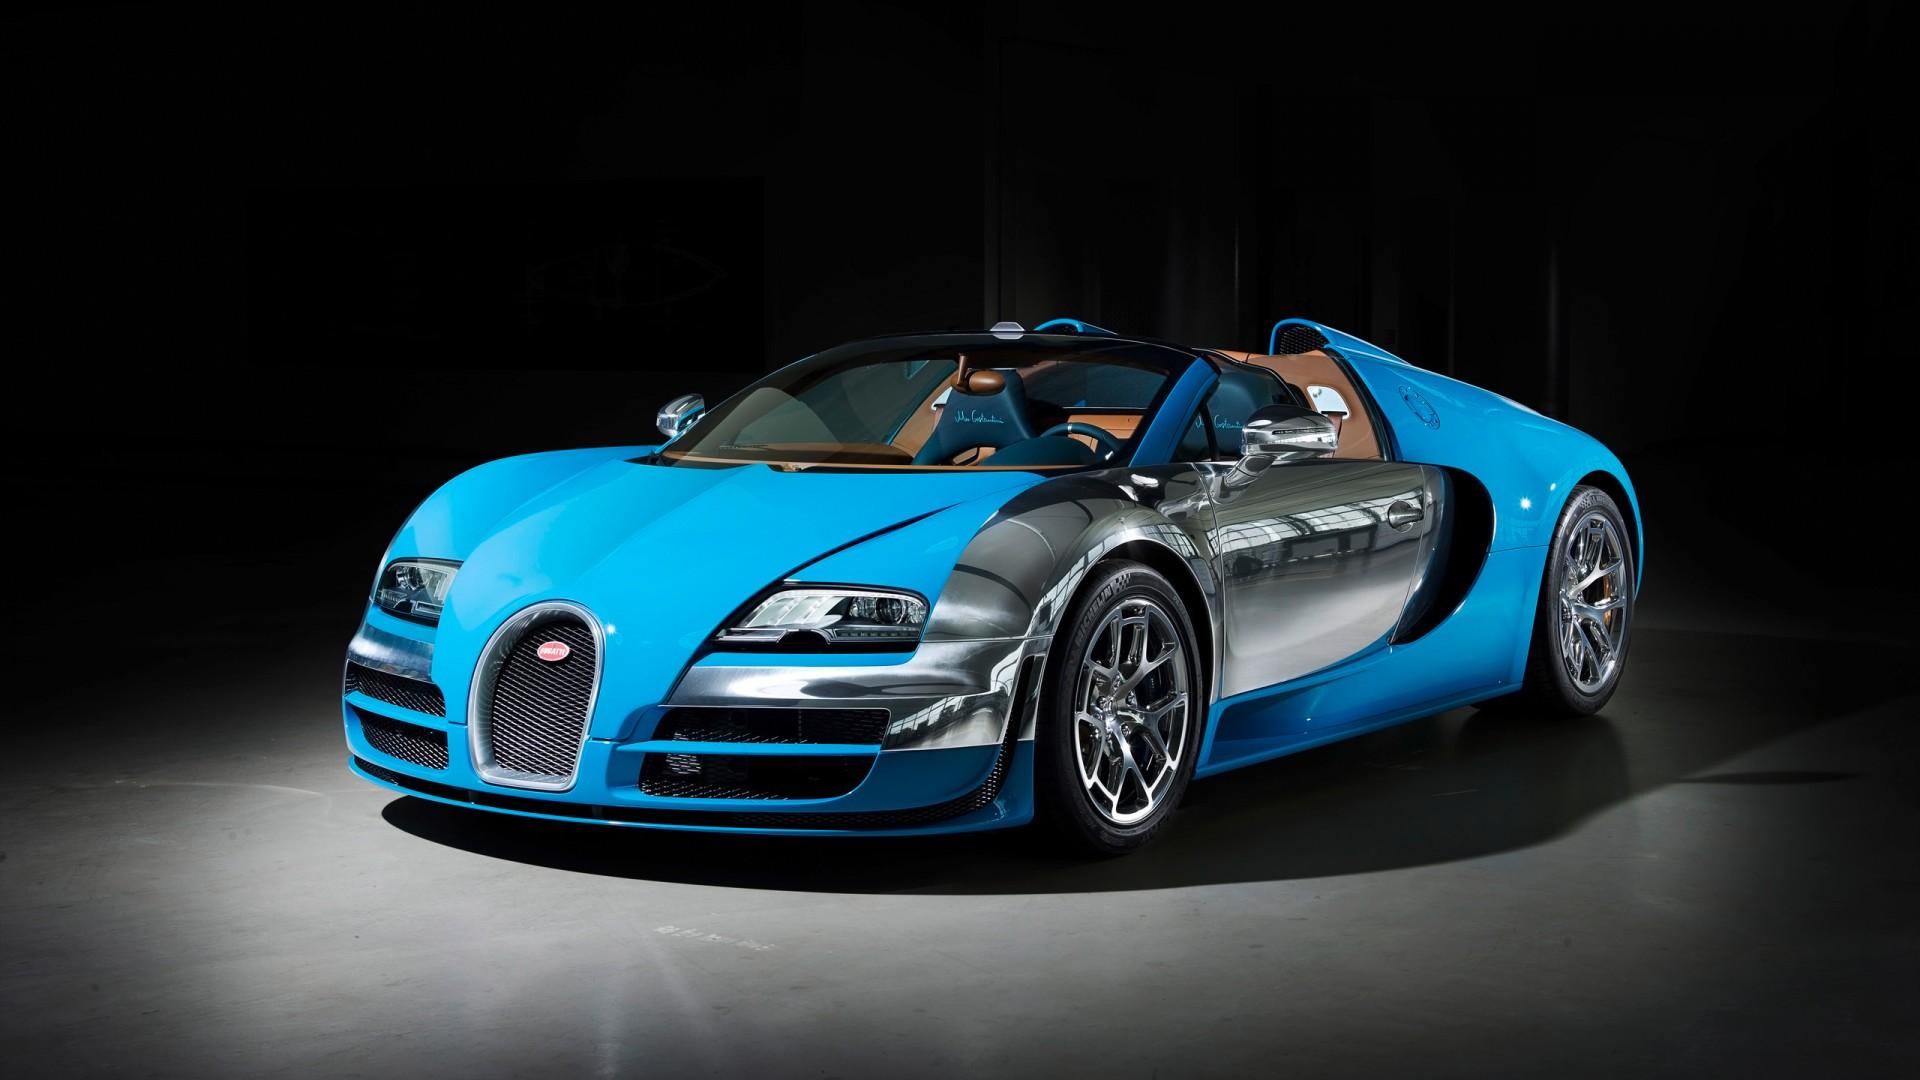 2013 bugatti veyron grand sport vitesse legend meo costantini wallpaper hd. Black Bedroom Furniture Sets. Home Design Ideas